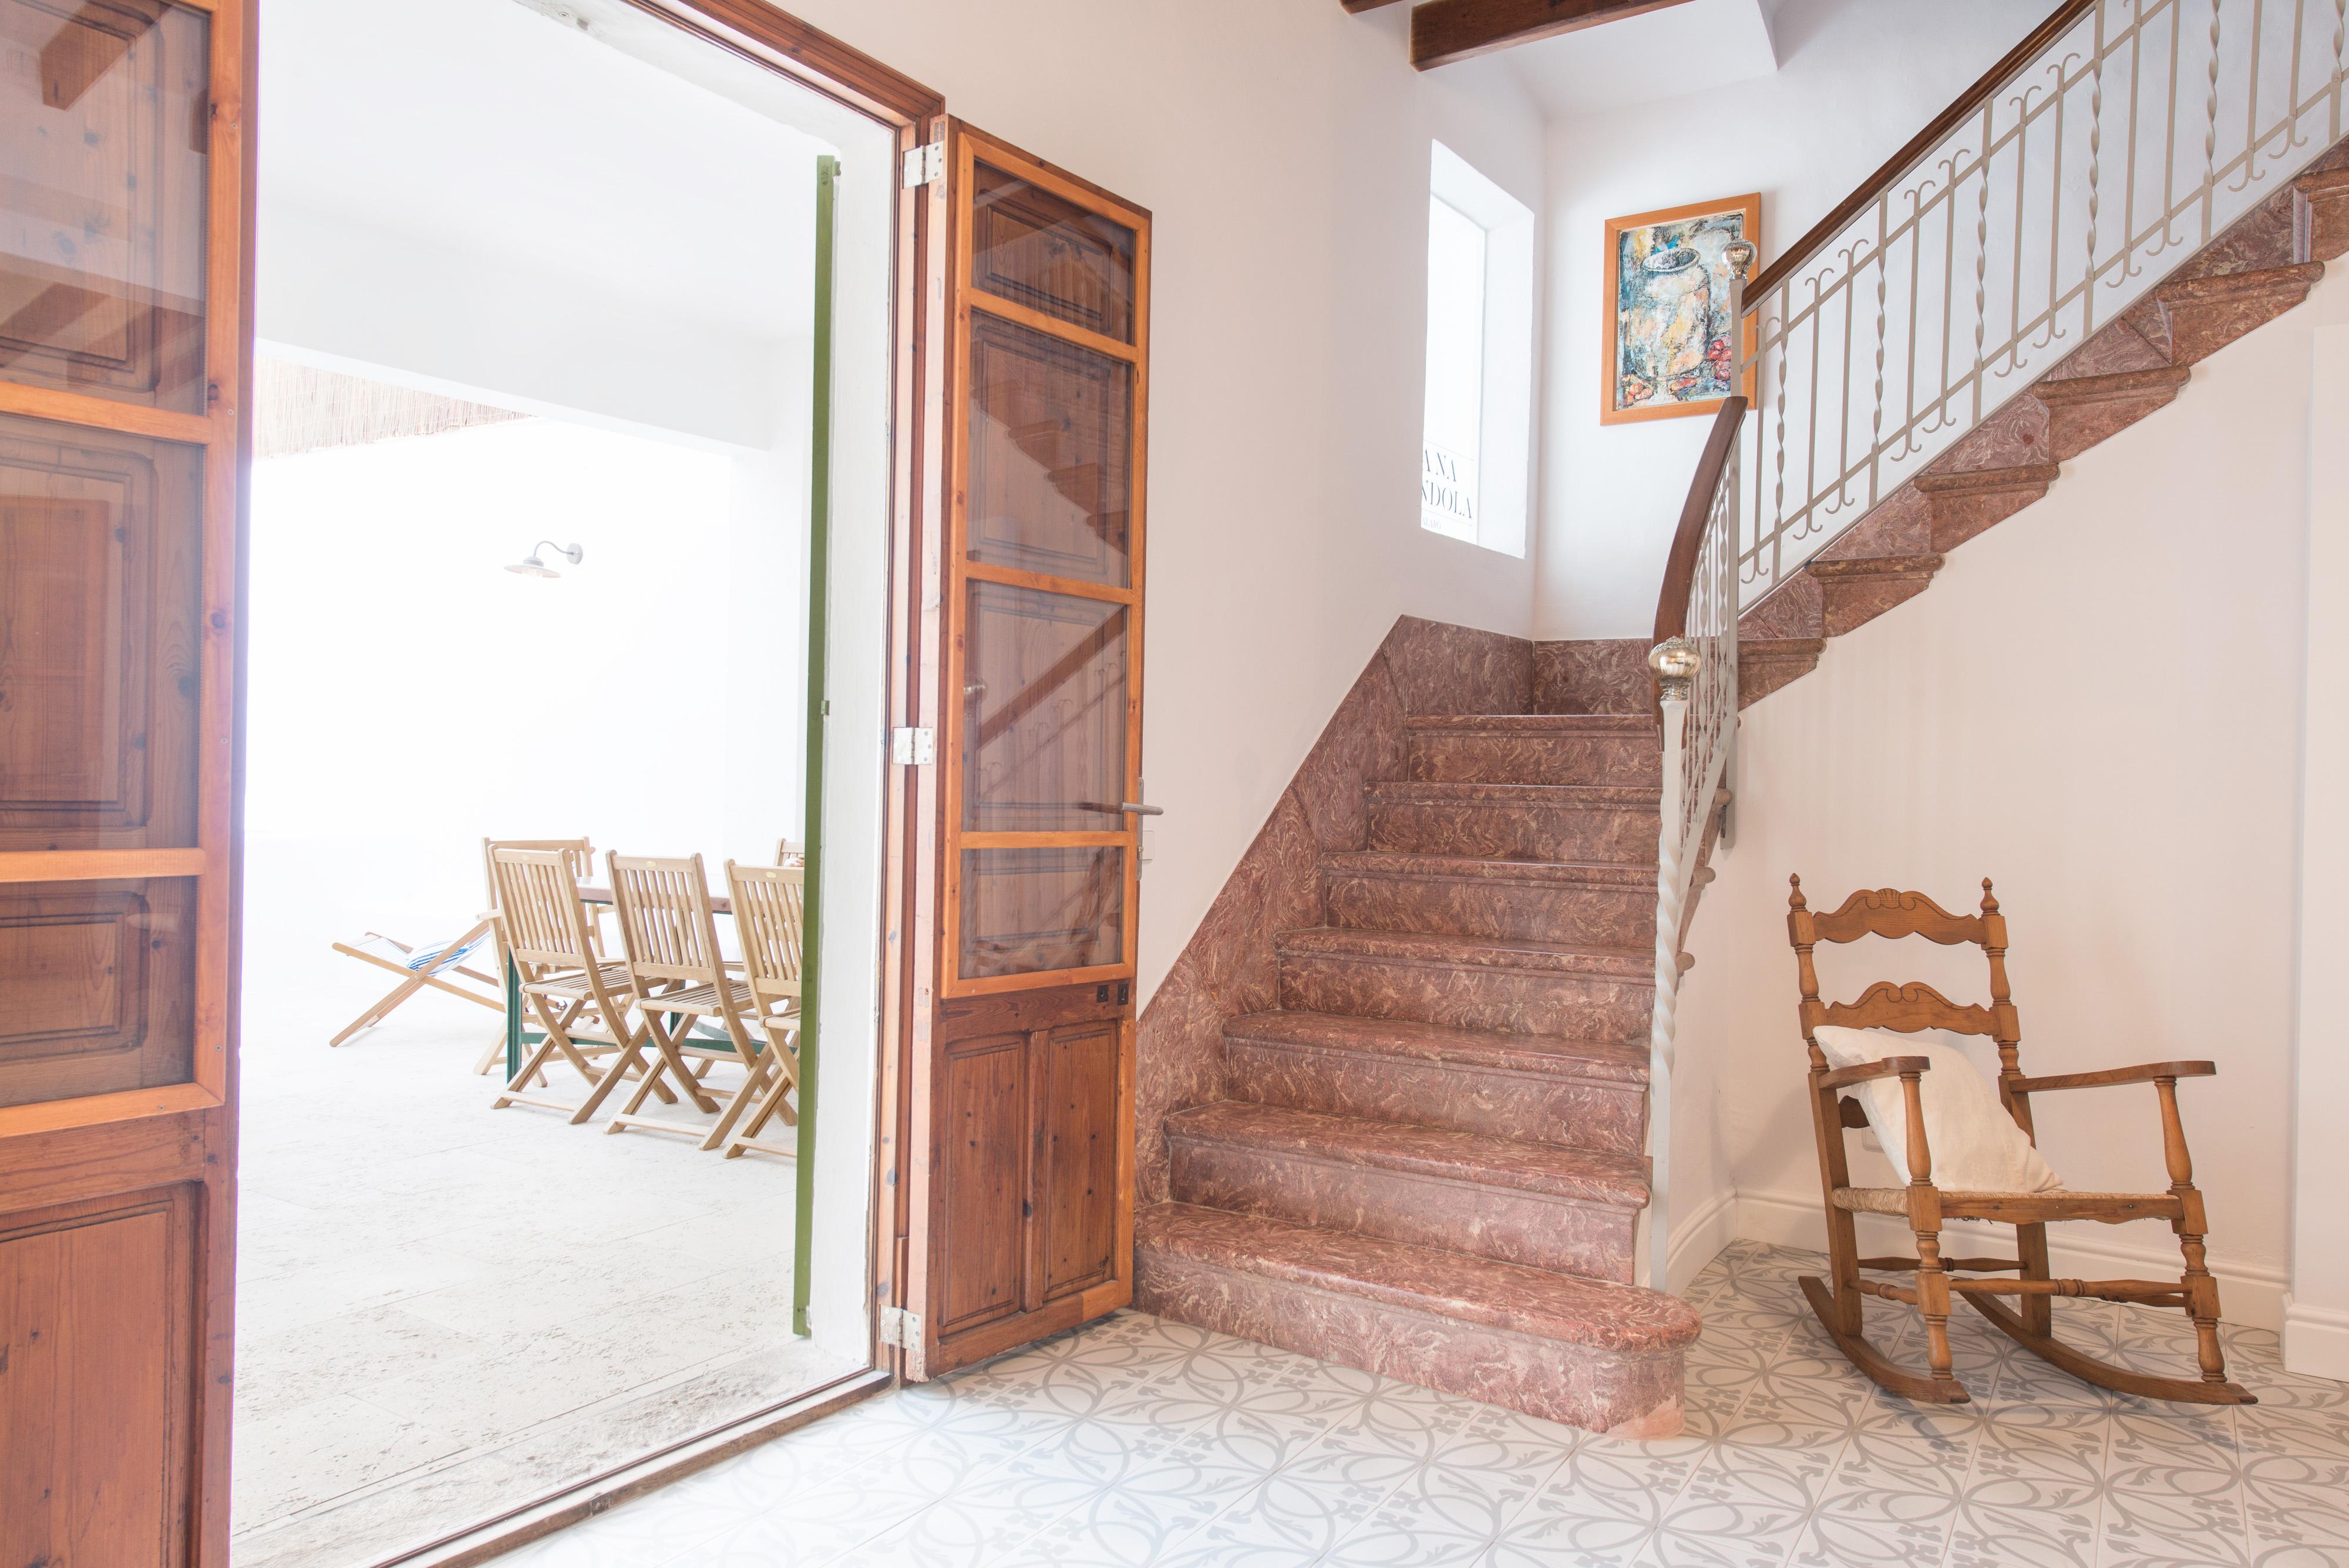 Maison de vacances CA NA MANDOLA (1956247), Alaro, Majorque, Iles Baléares, Espagne, image 14